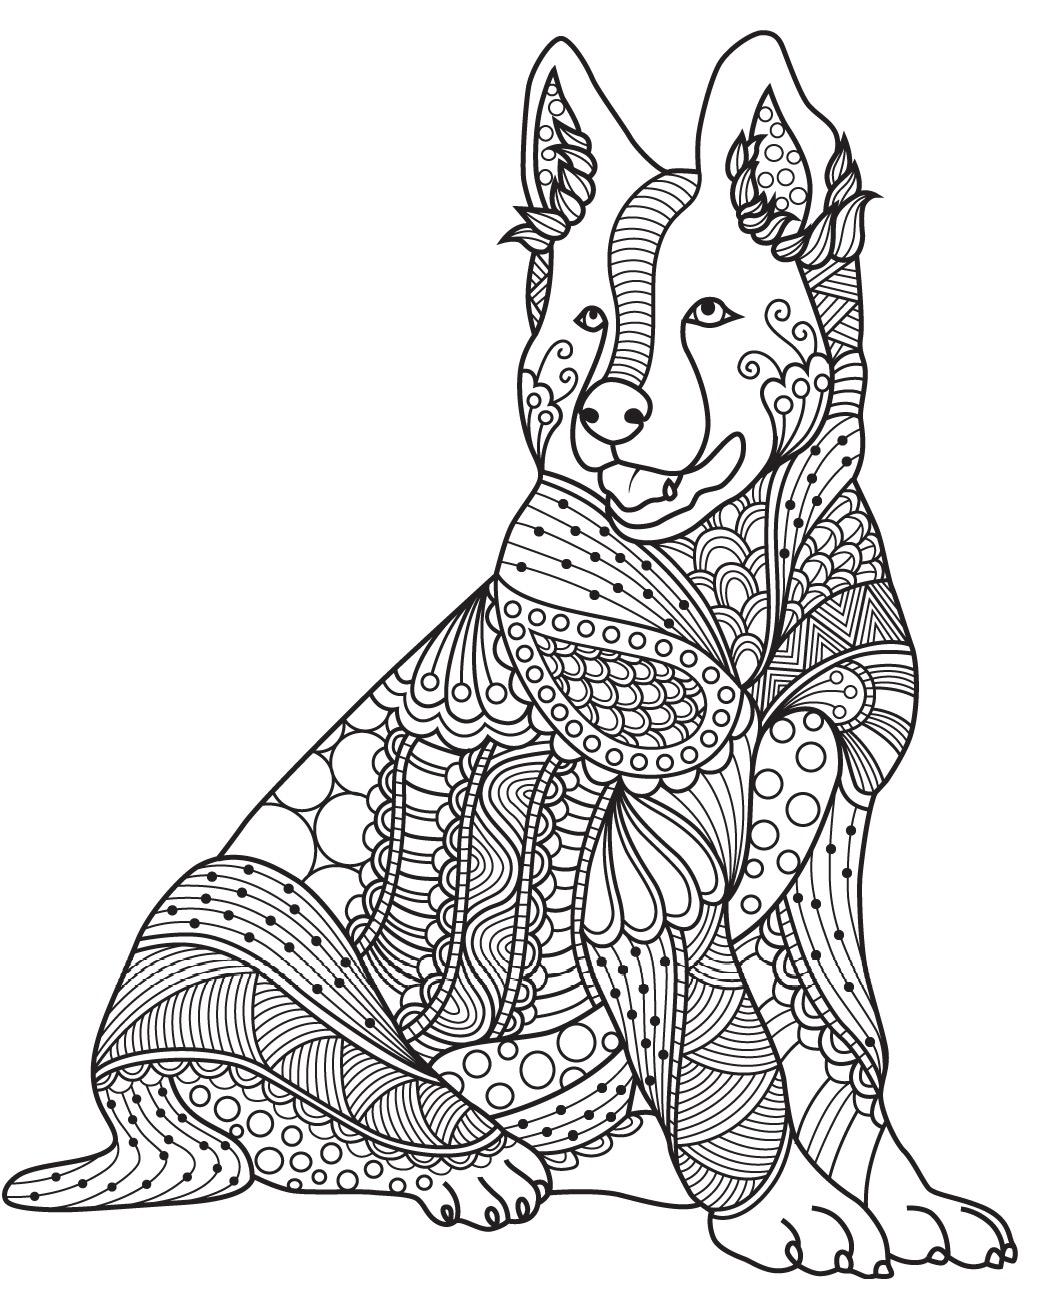 1053x1314 Dog Colorish Coloring Book For Adults Mandala Relax